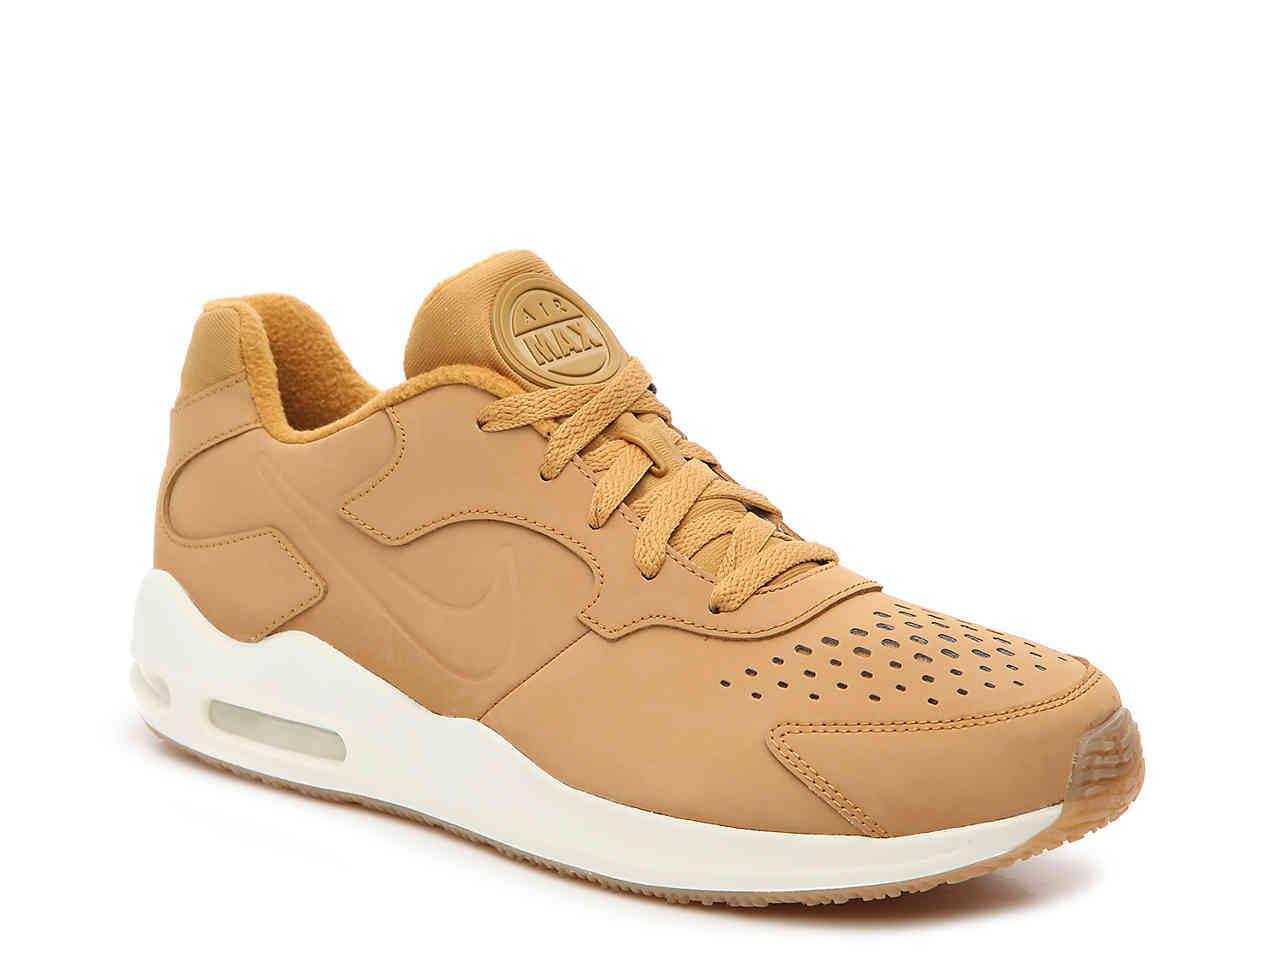 83e8e536bd84 ... italy nike. mens brown air max guile premium sneaker 97f79 d5e58